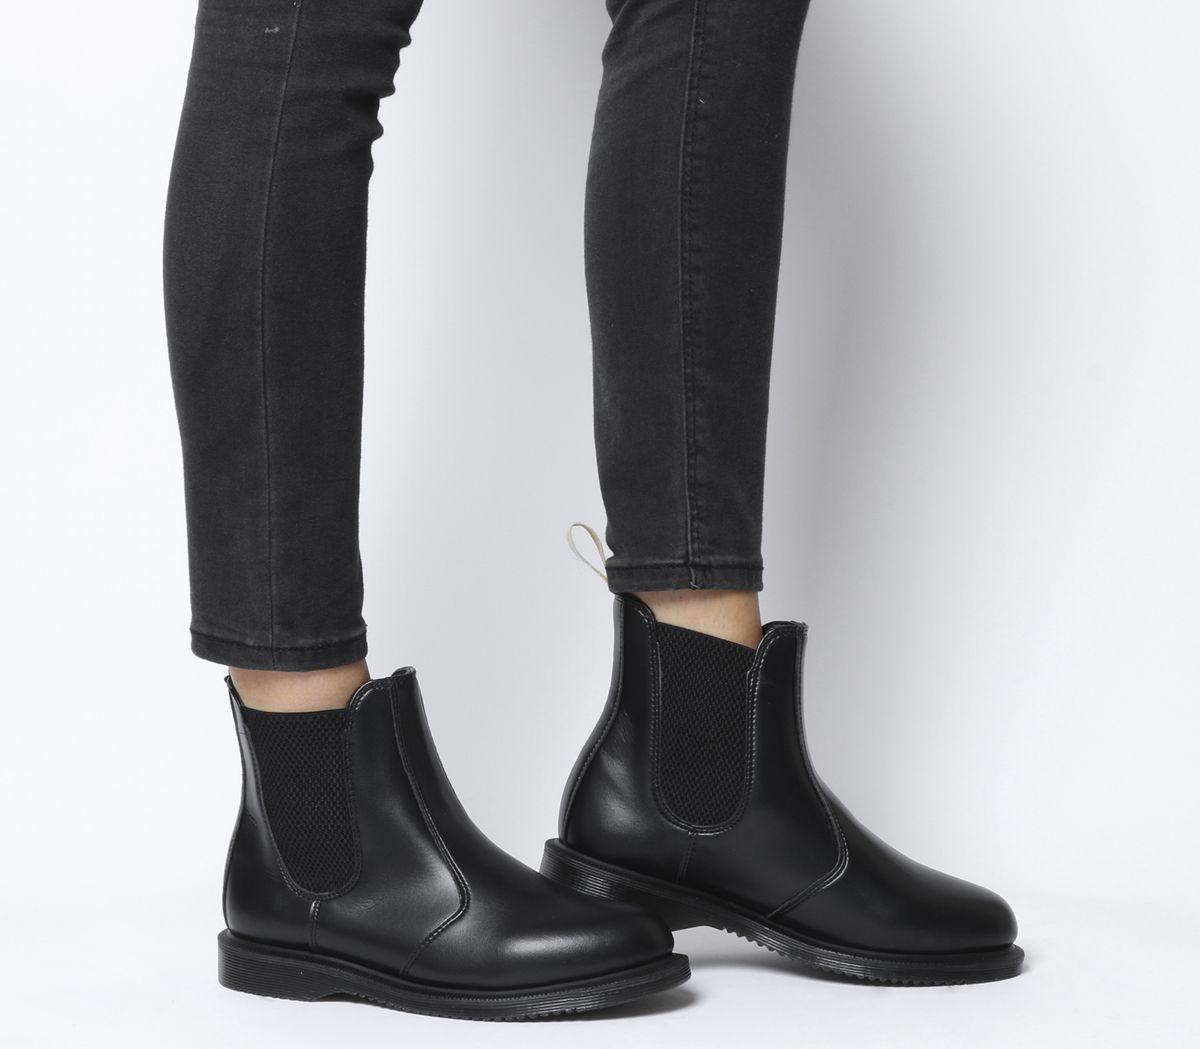 8131c62e7b4 Vegan Flora Chelsea Boots